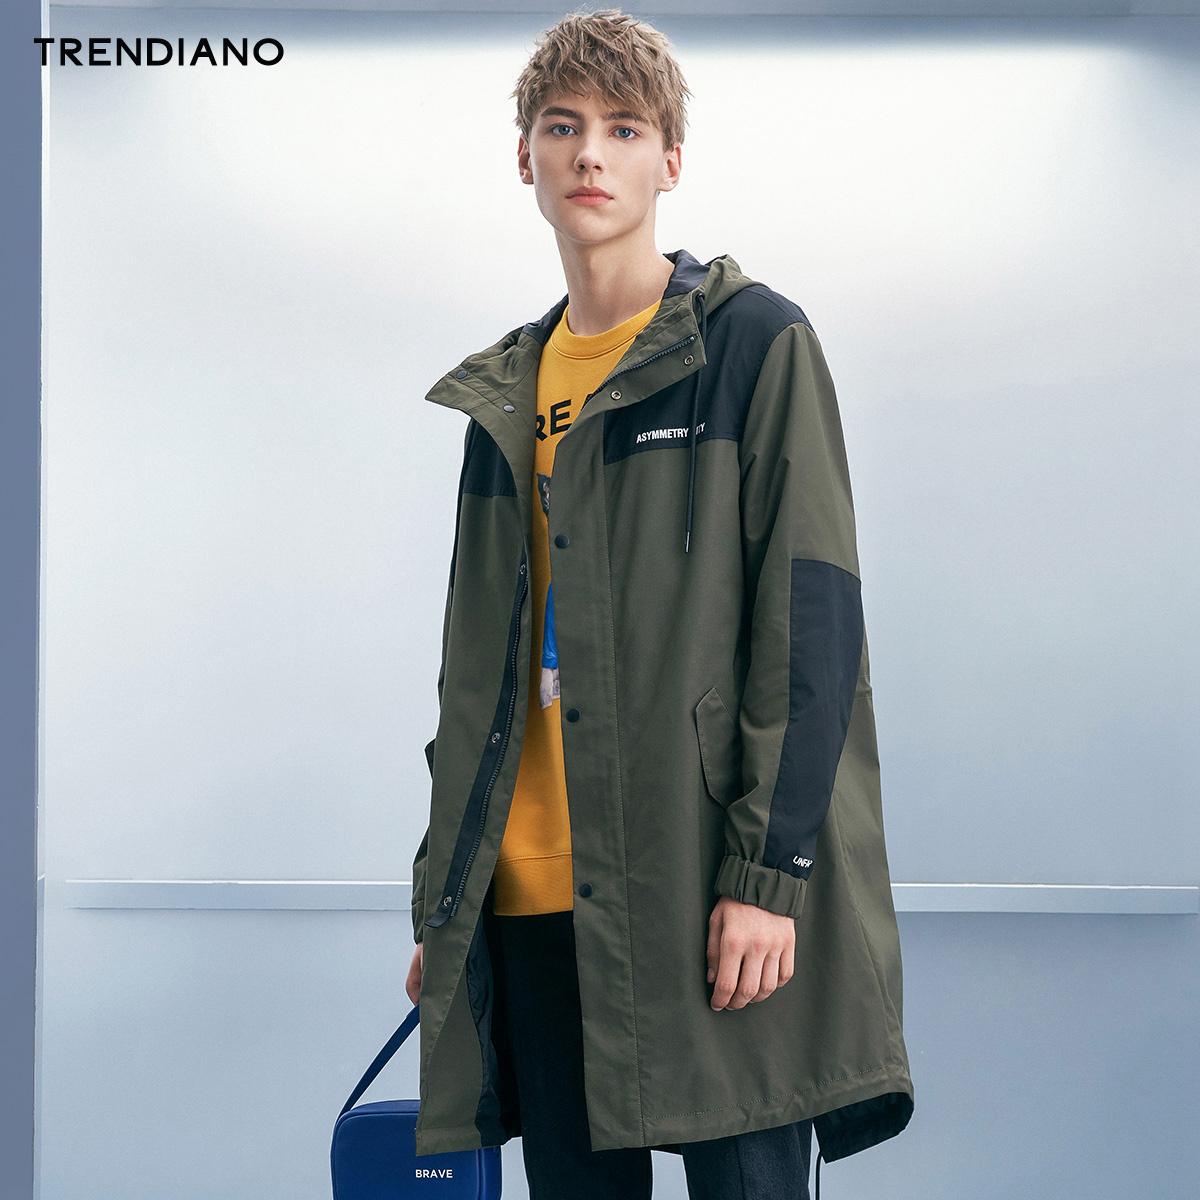 TRENDIANO新2018男装秋装拼接字母中长款宽松风衣外套3GC304764P